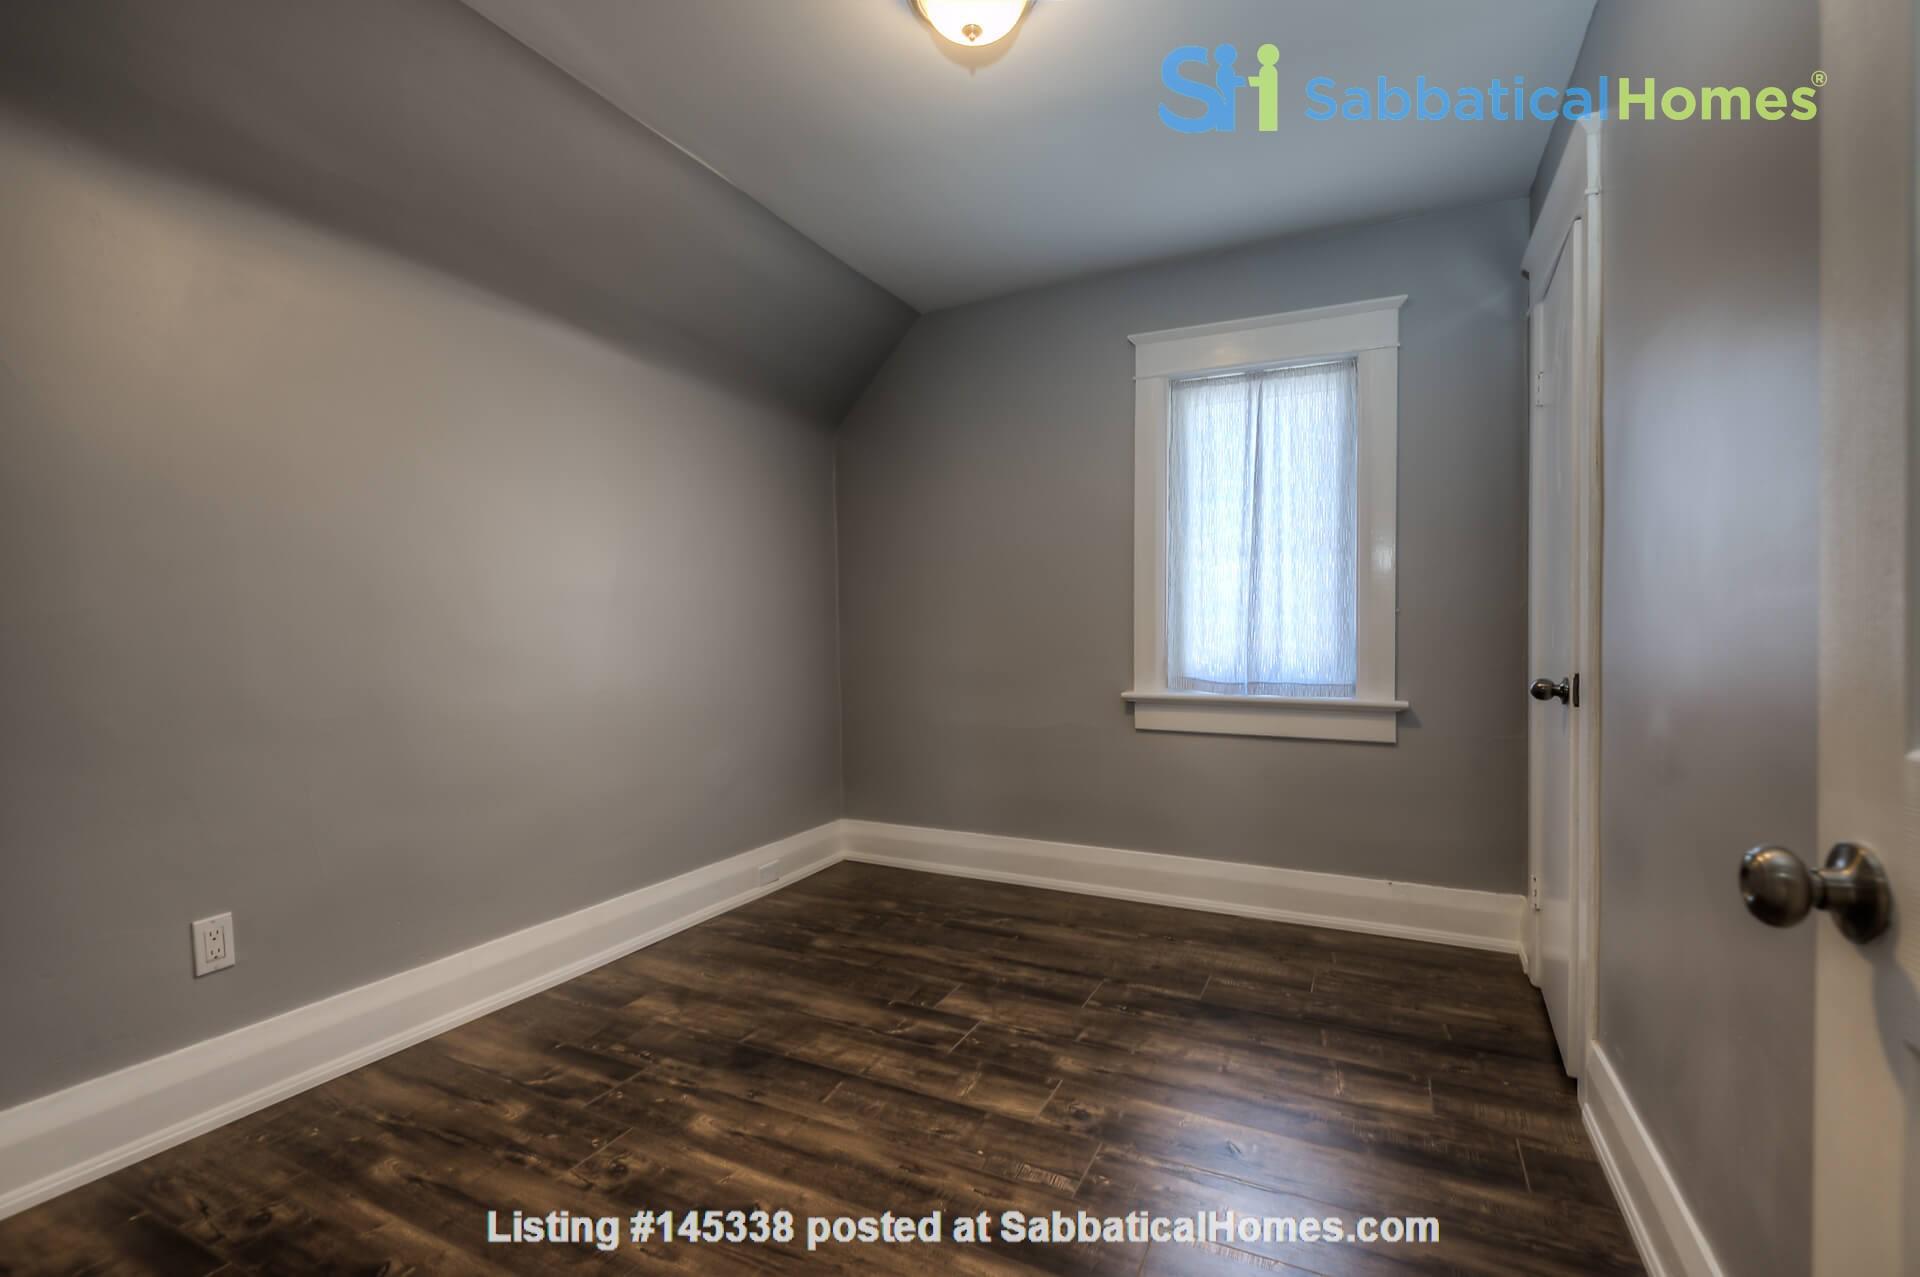 3 bdrm home (unfurnished) - downtown Kitchener-Waterloo Home Rental in Kitchener, Ontario, Canada 6